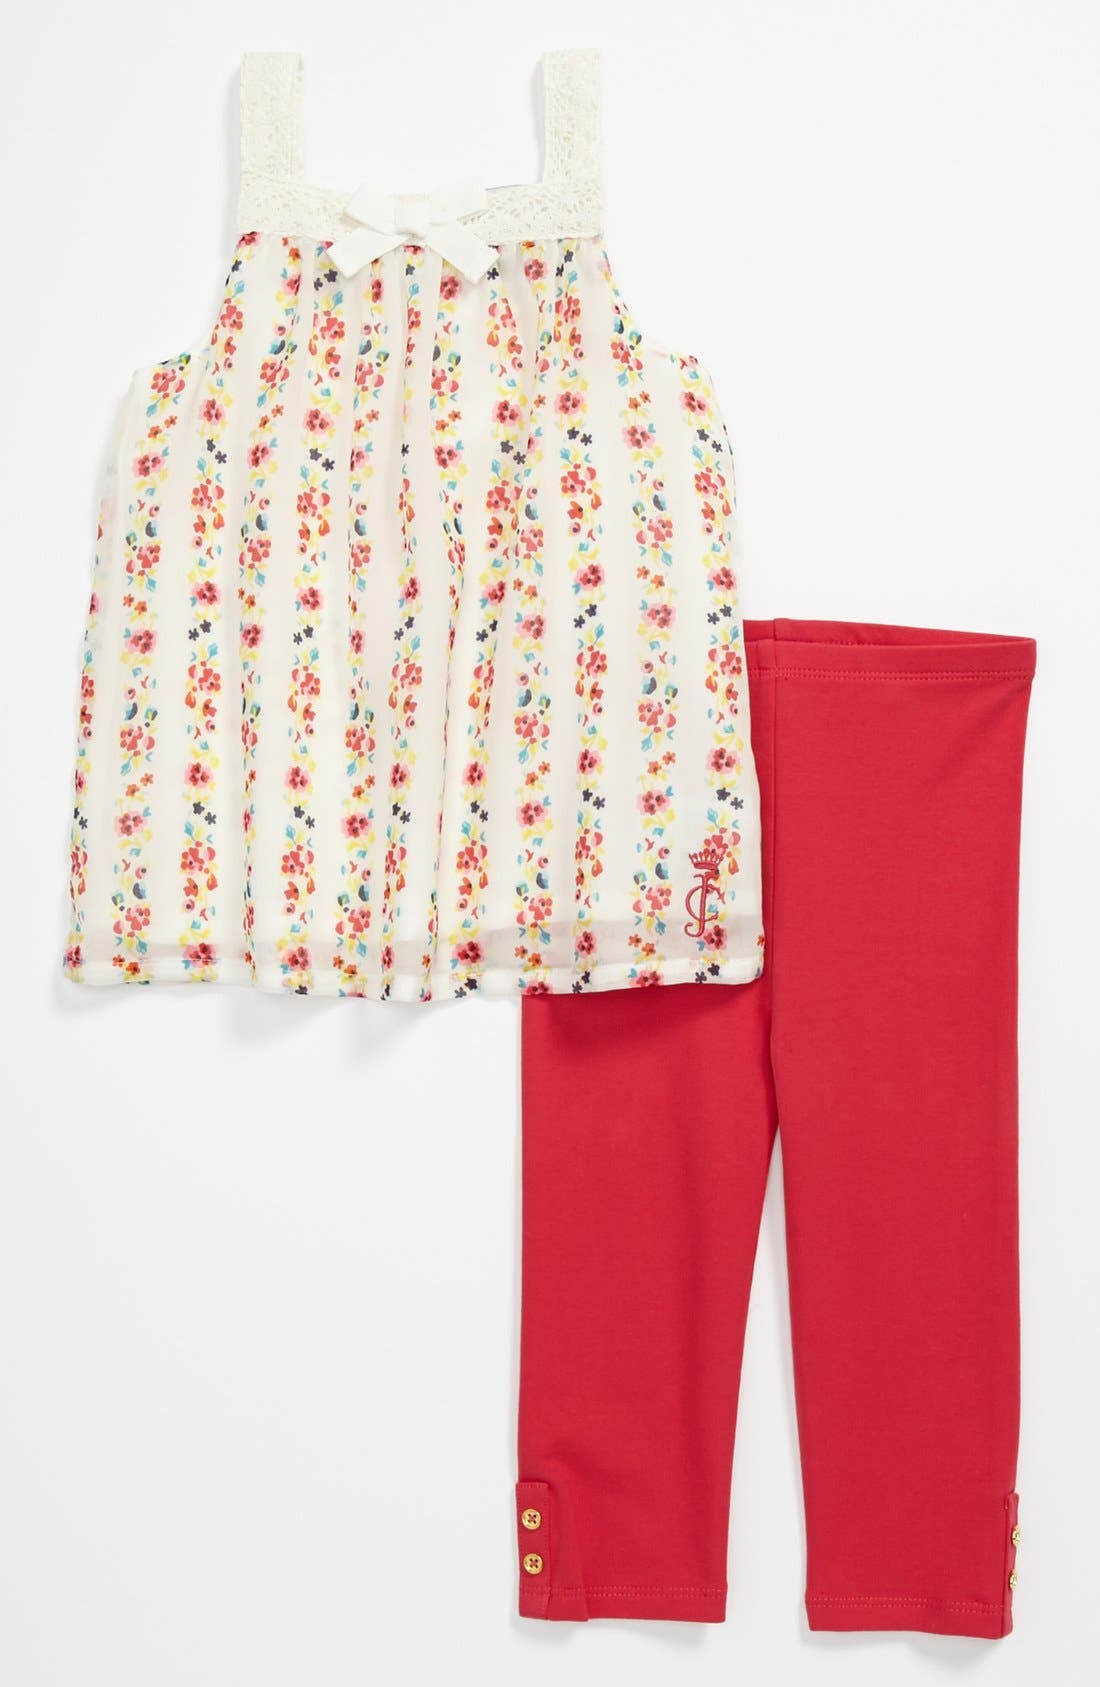 Main Image - Juicy Couture Tank Top & Leggings (Baby Girls)